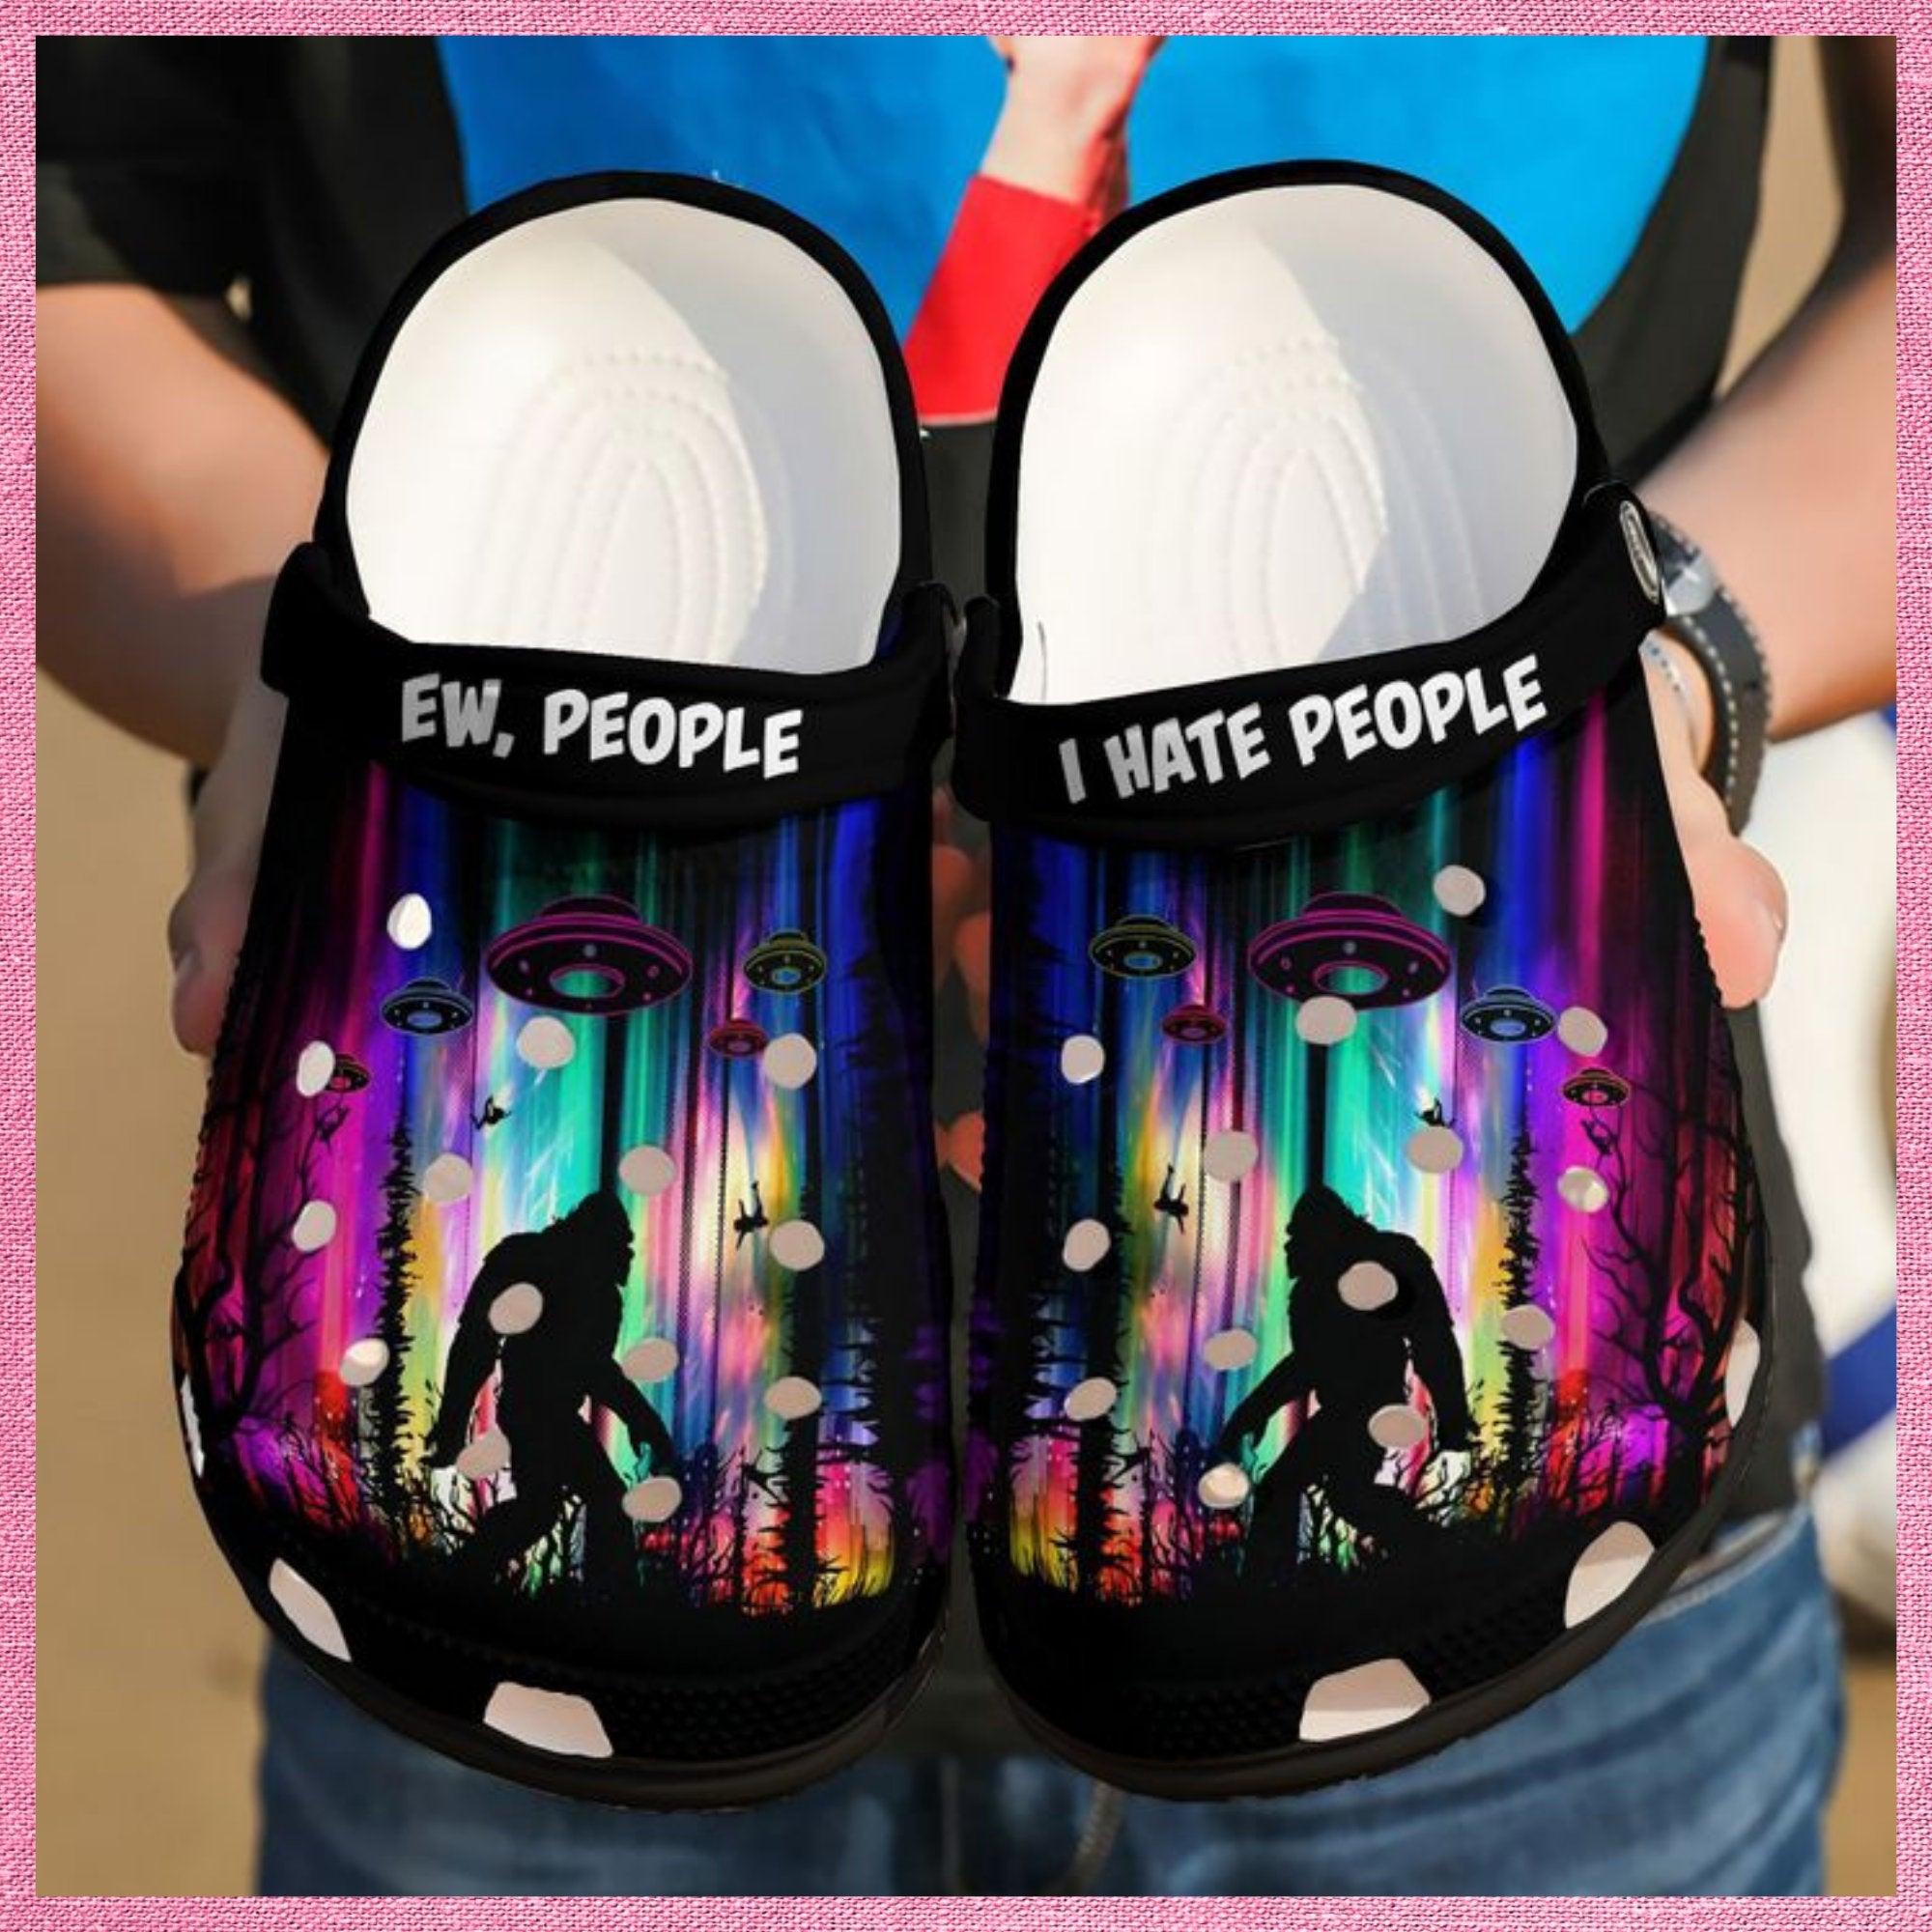 Camping Ew People Crocs Clog Shoes